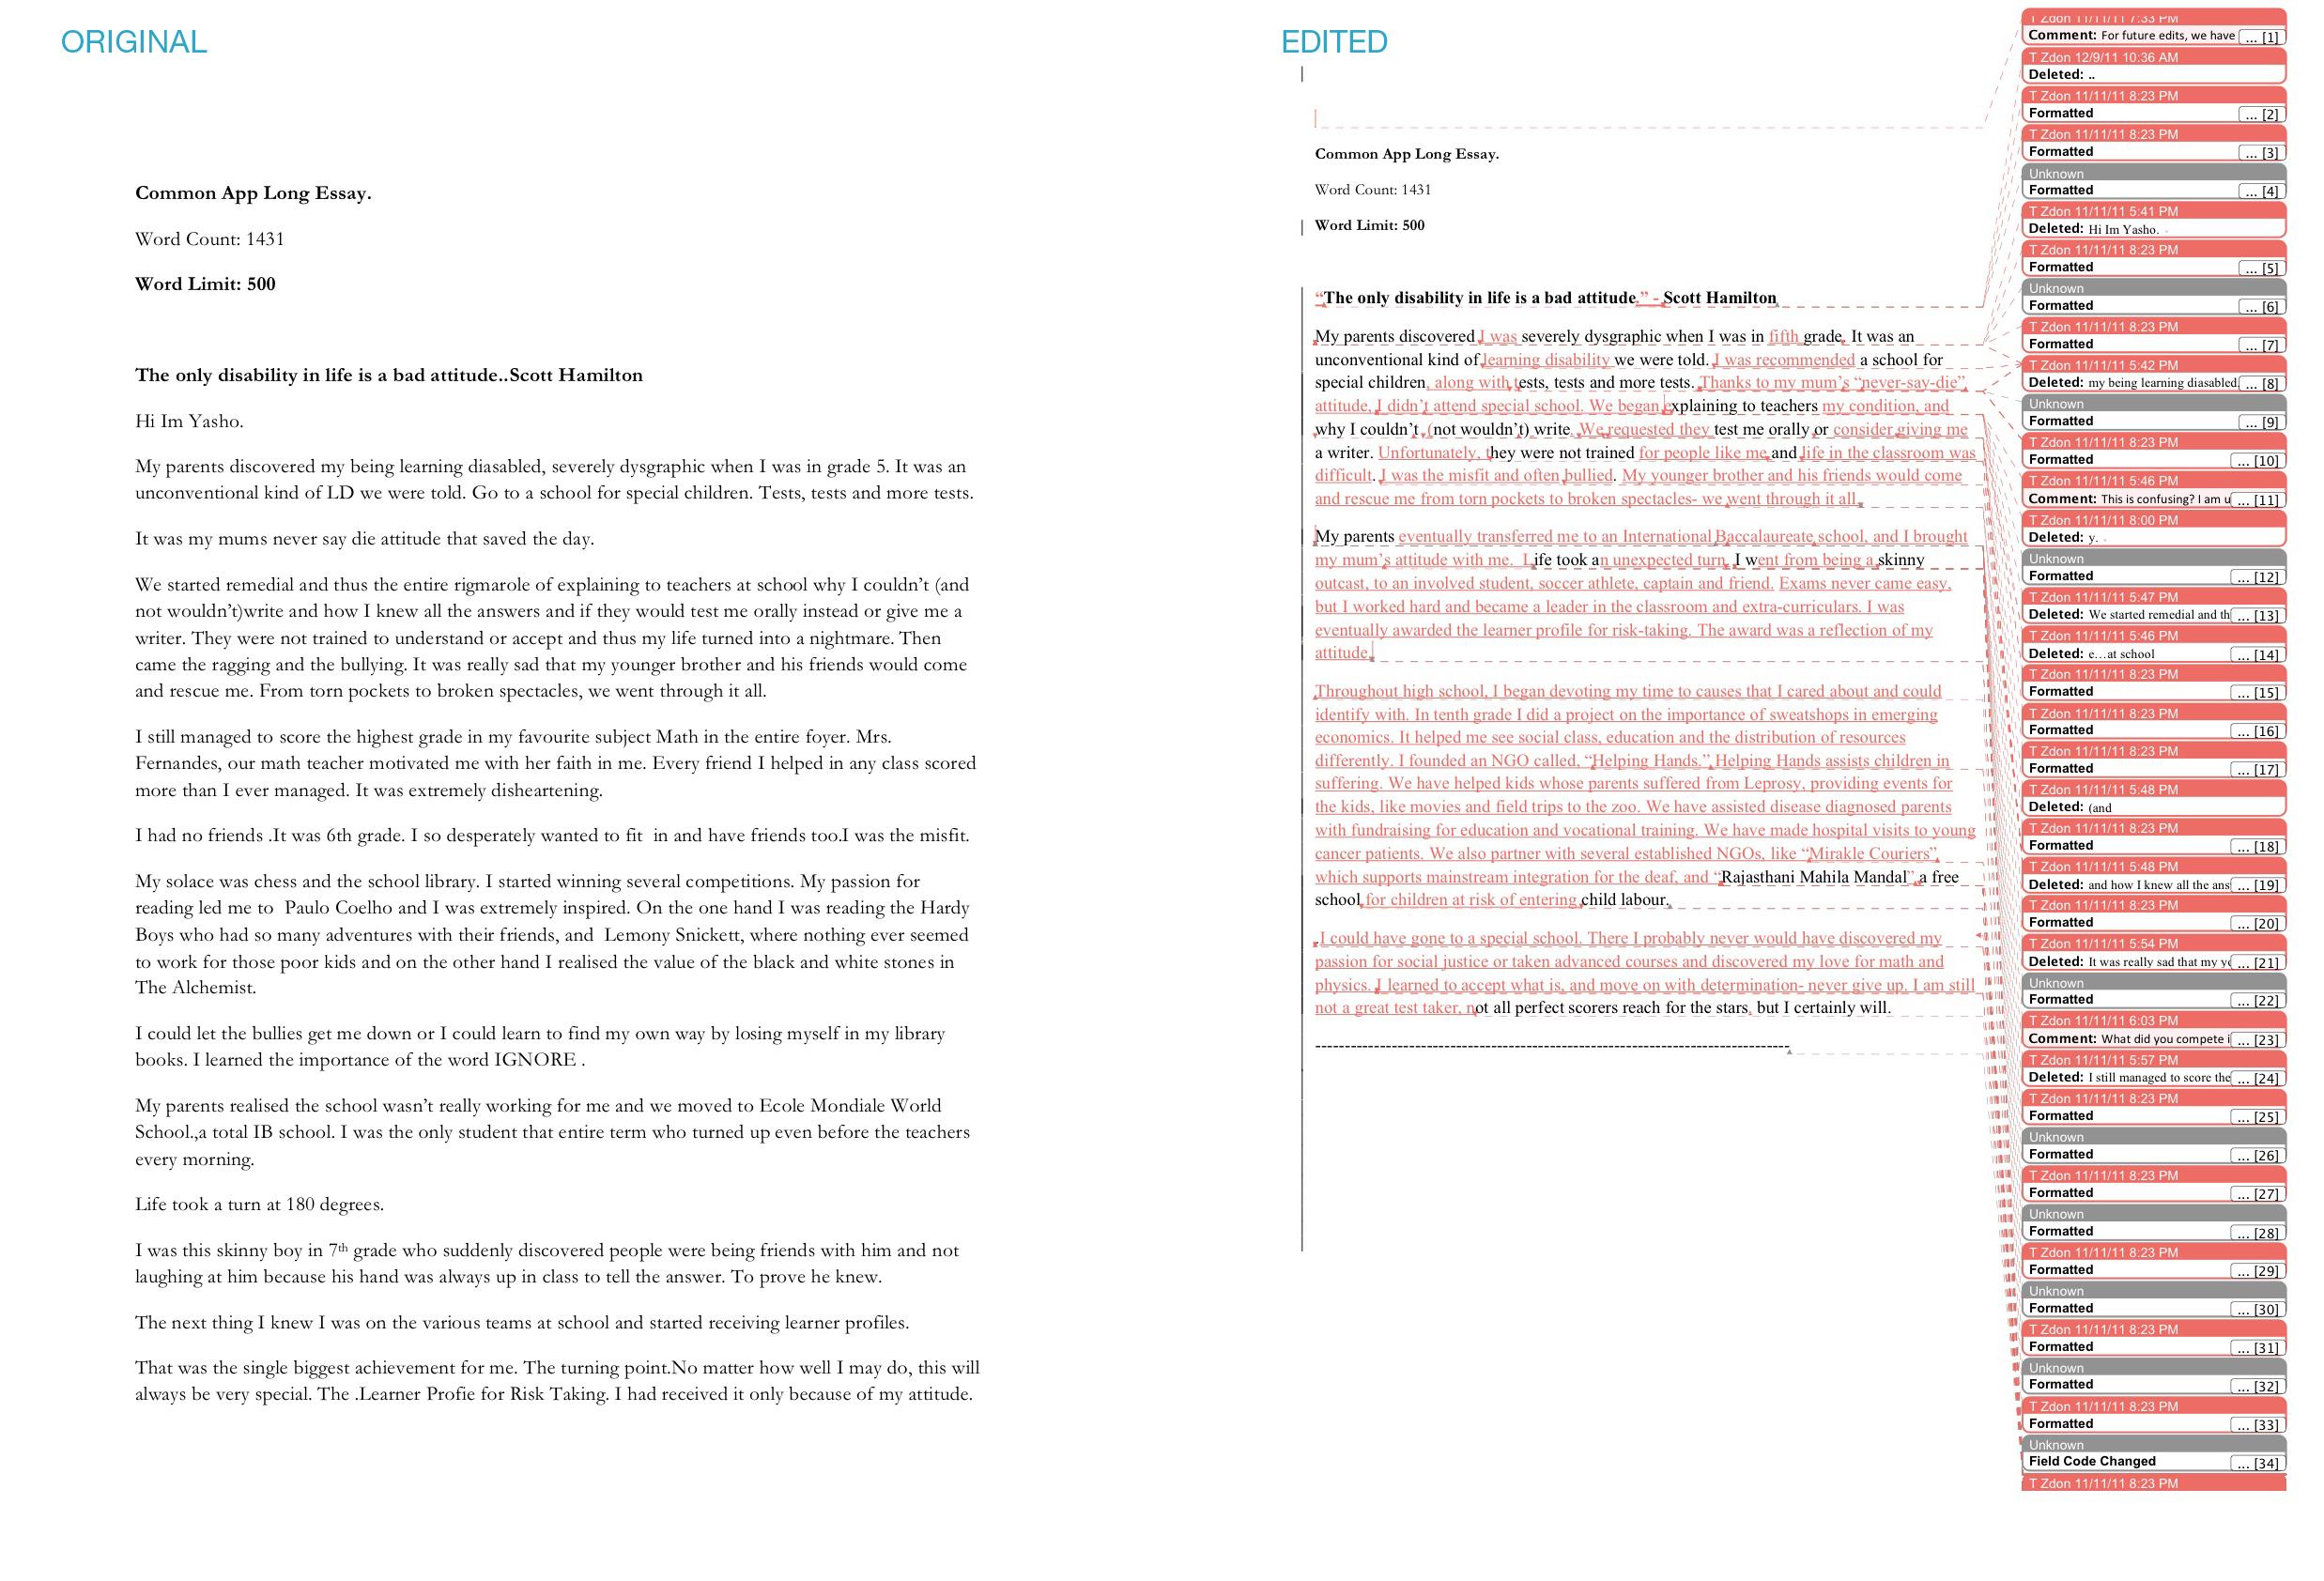 007 Common Application Essay App Example Best Essays Samples Option 1 Prompt 2016 2017 Full